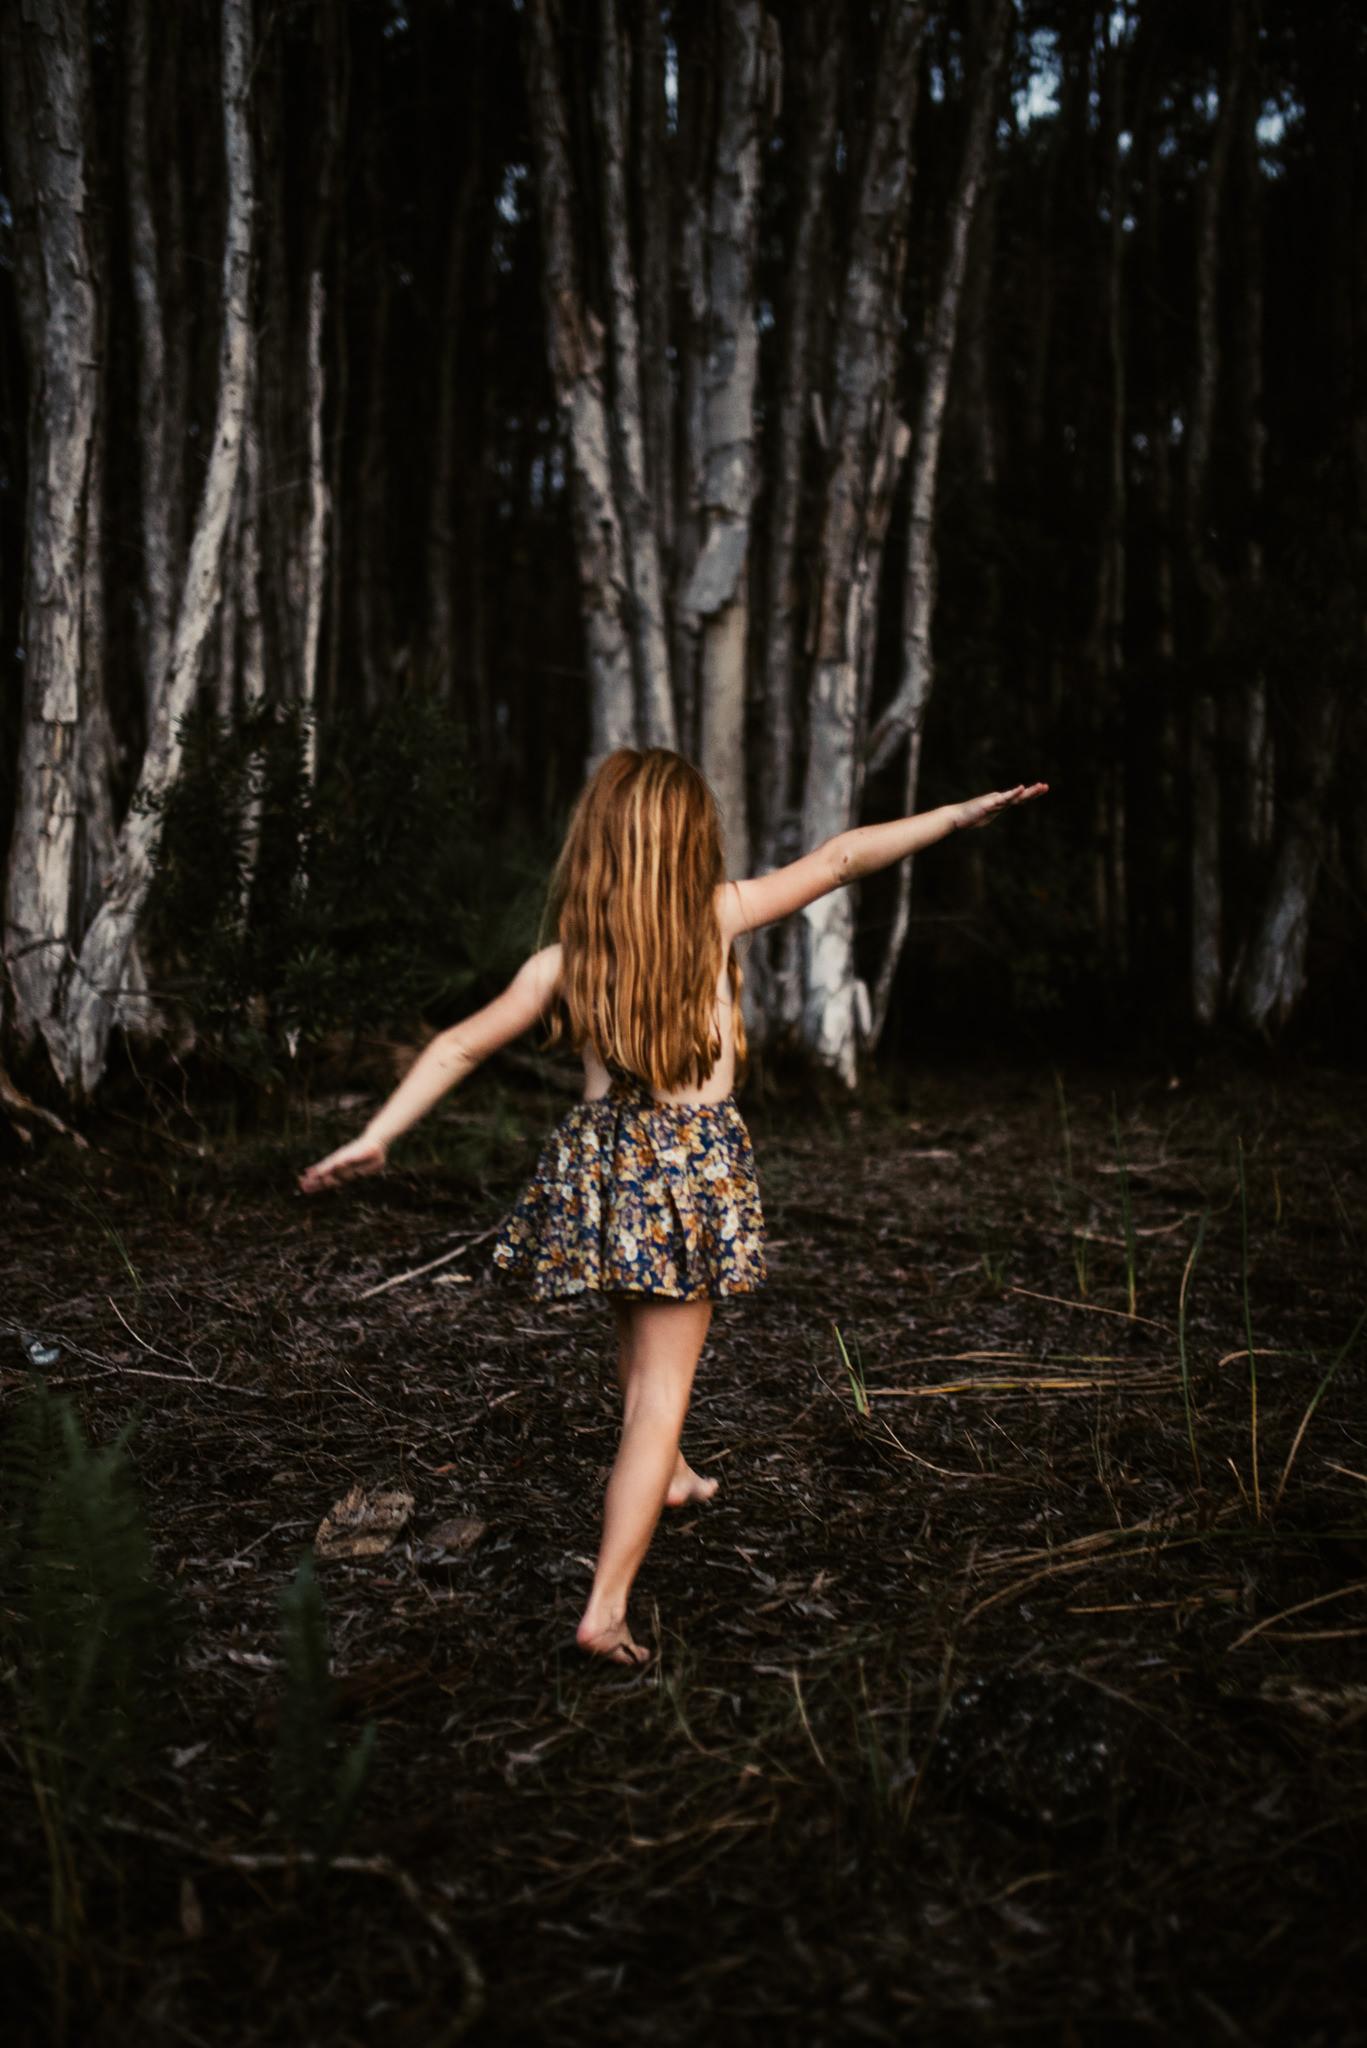 twyla jones photography - treasure coast florida - childrens adventure clothing commercial shoot--56.jpg